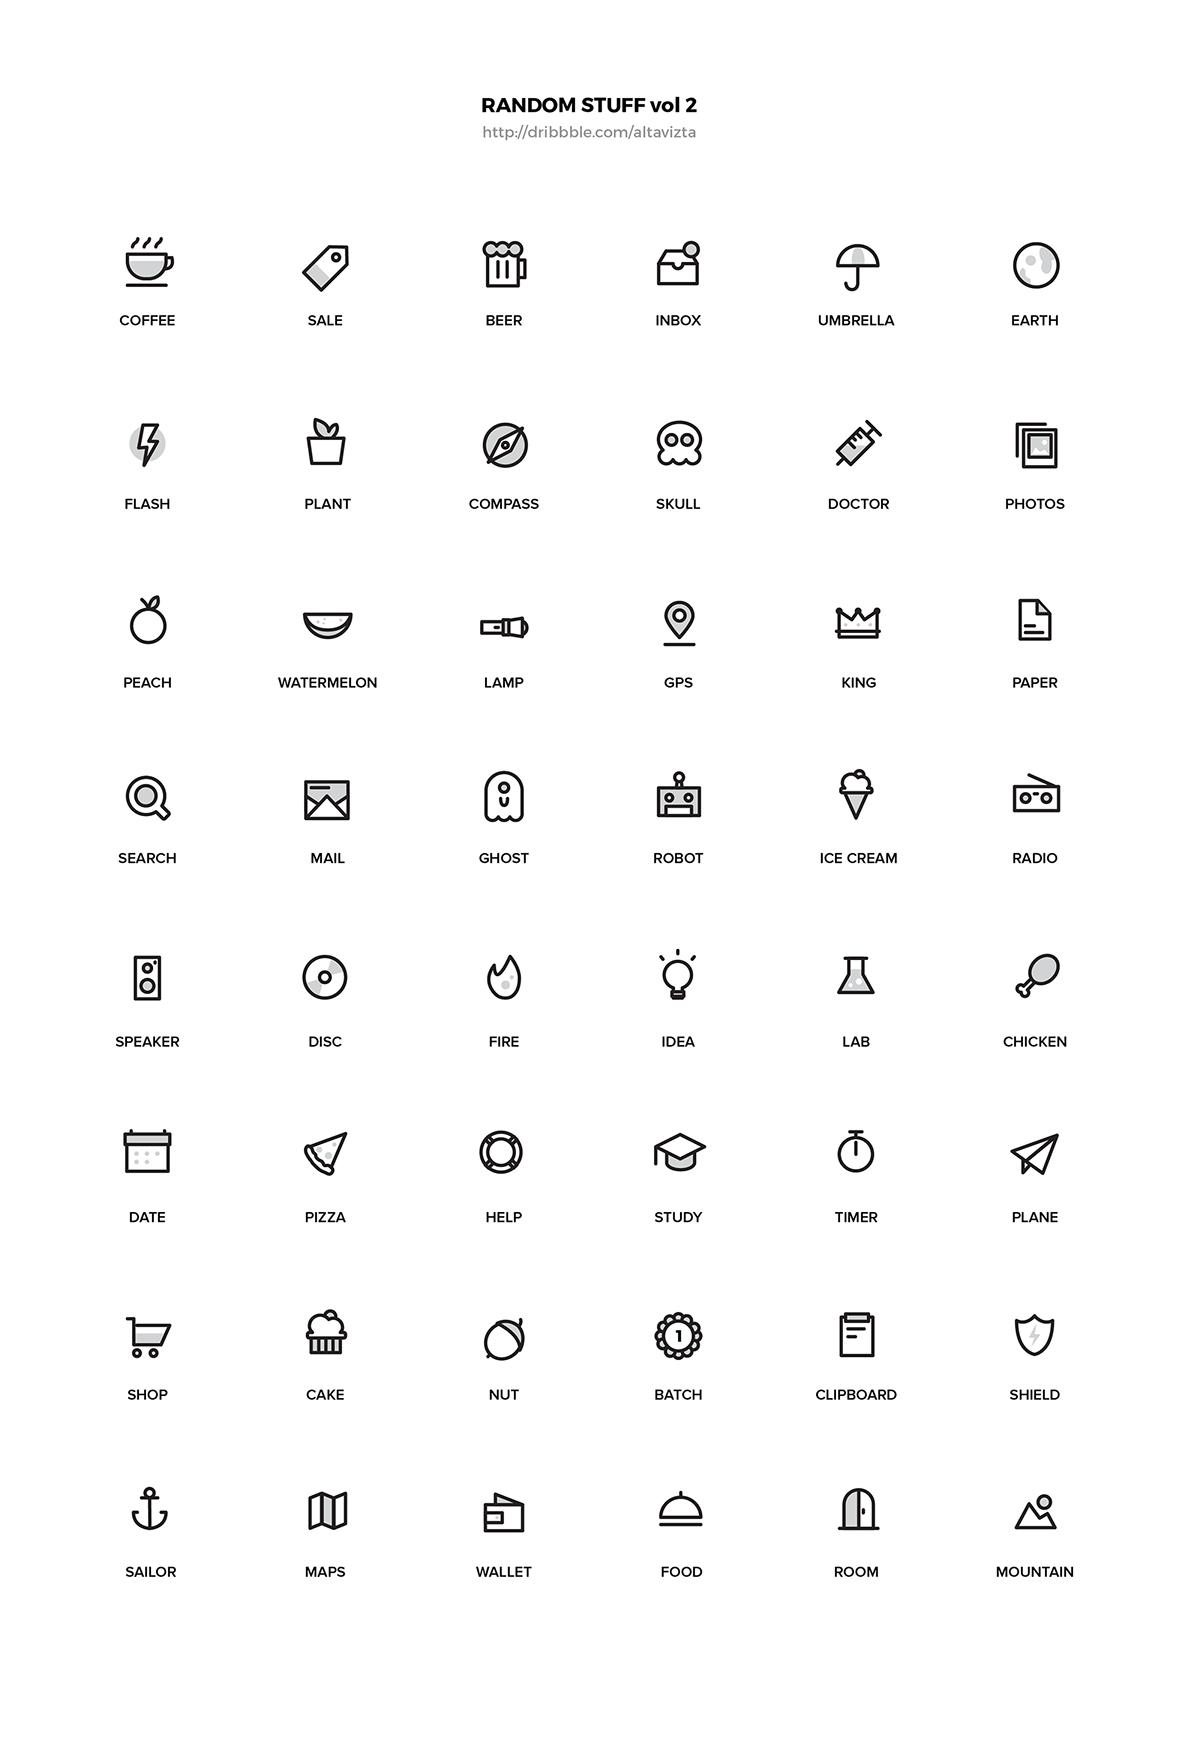 Random Stuff Free Iconset vol 2 on Behance